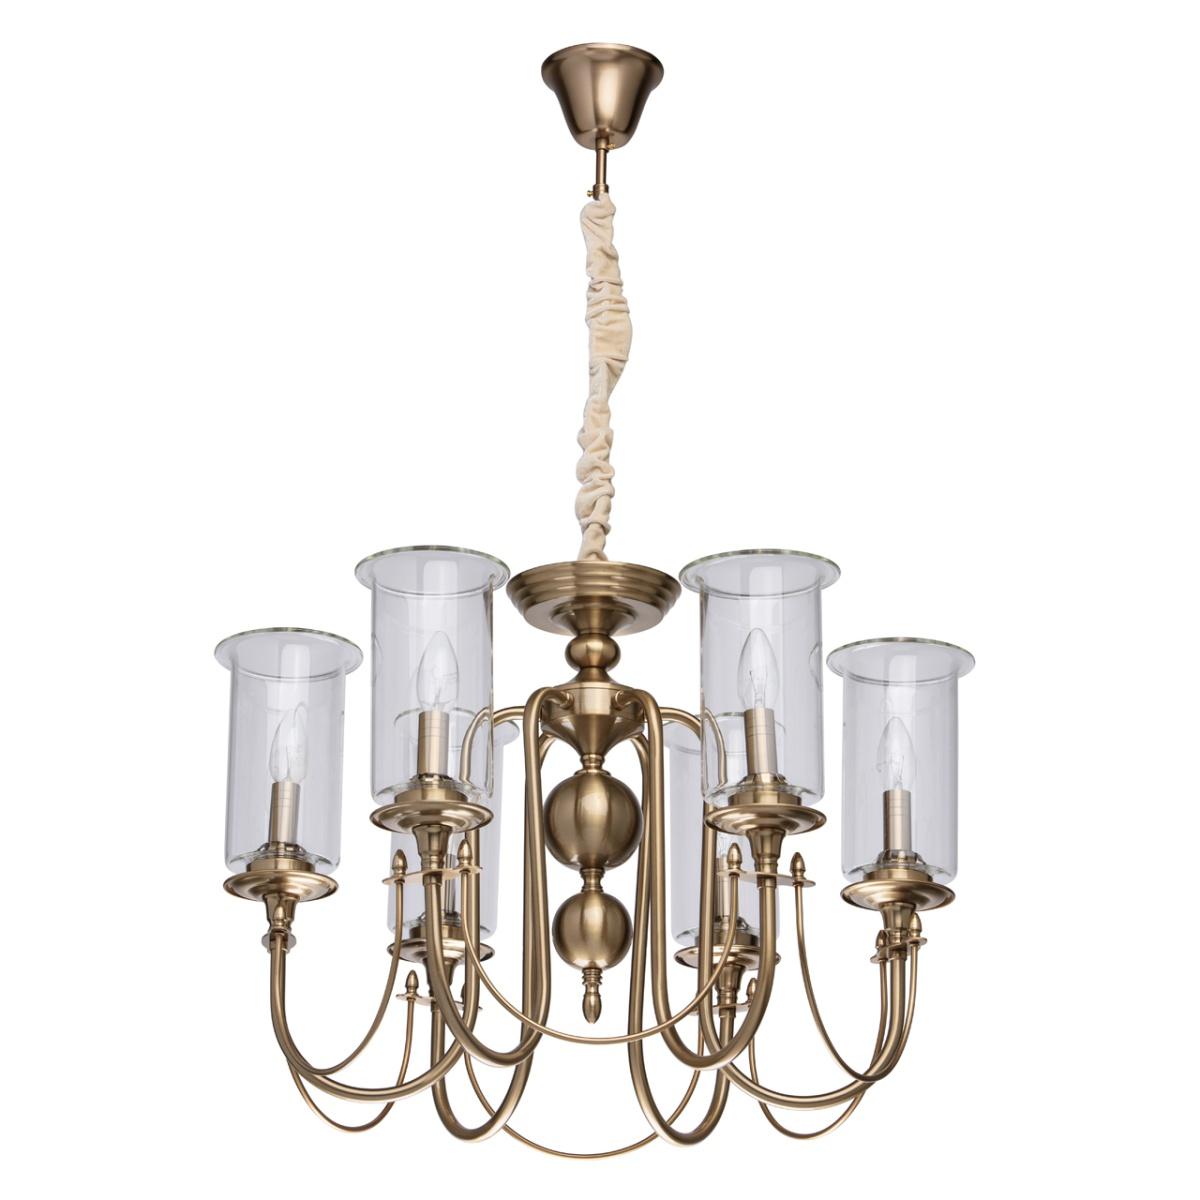 Lustra Light Neoclassic